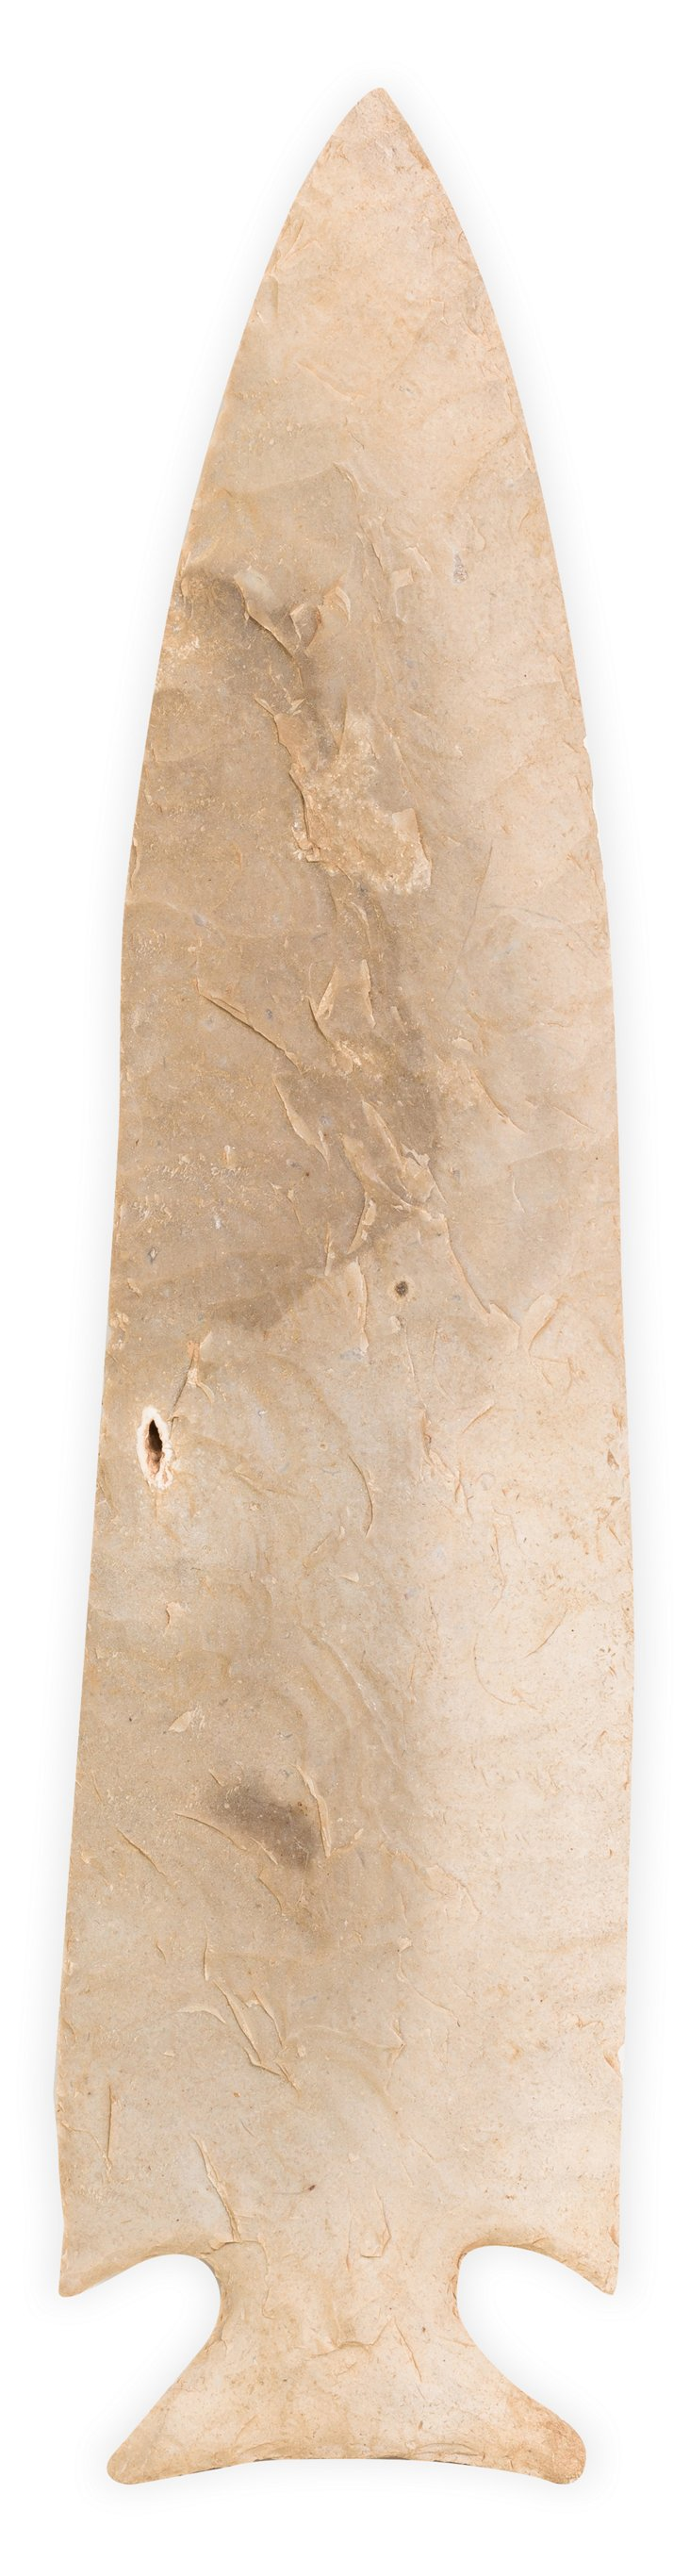 Native American Arrowhead, Large VI